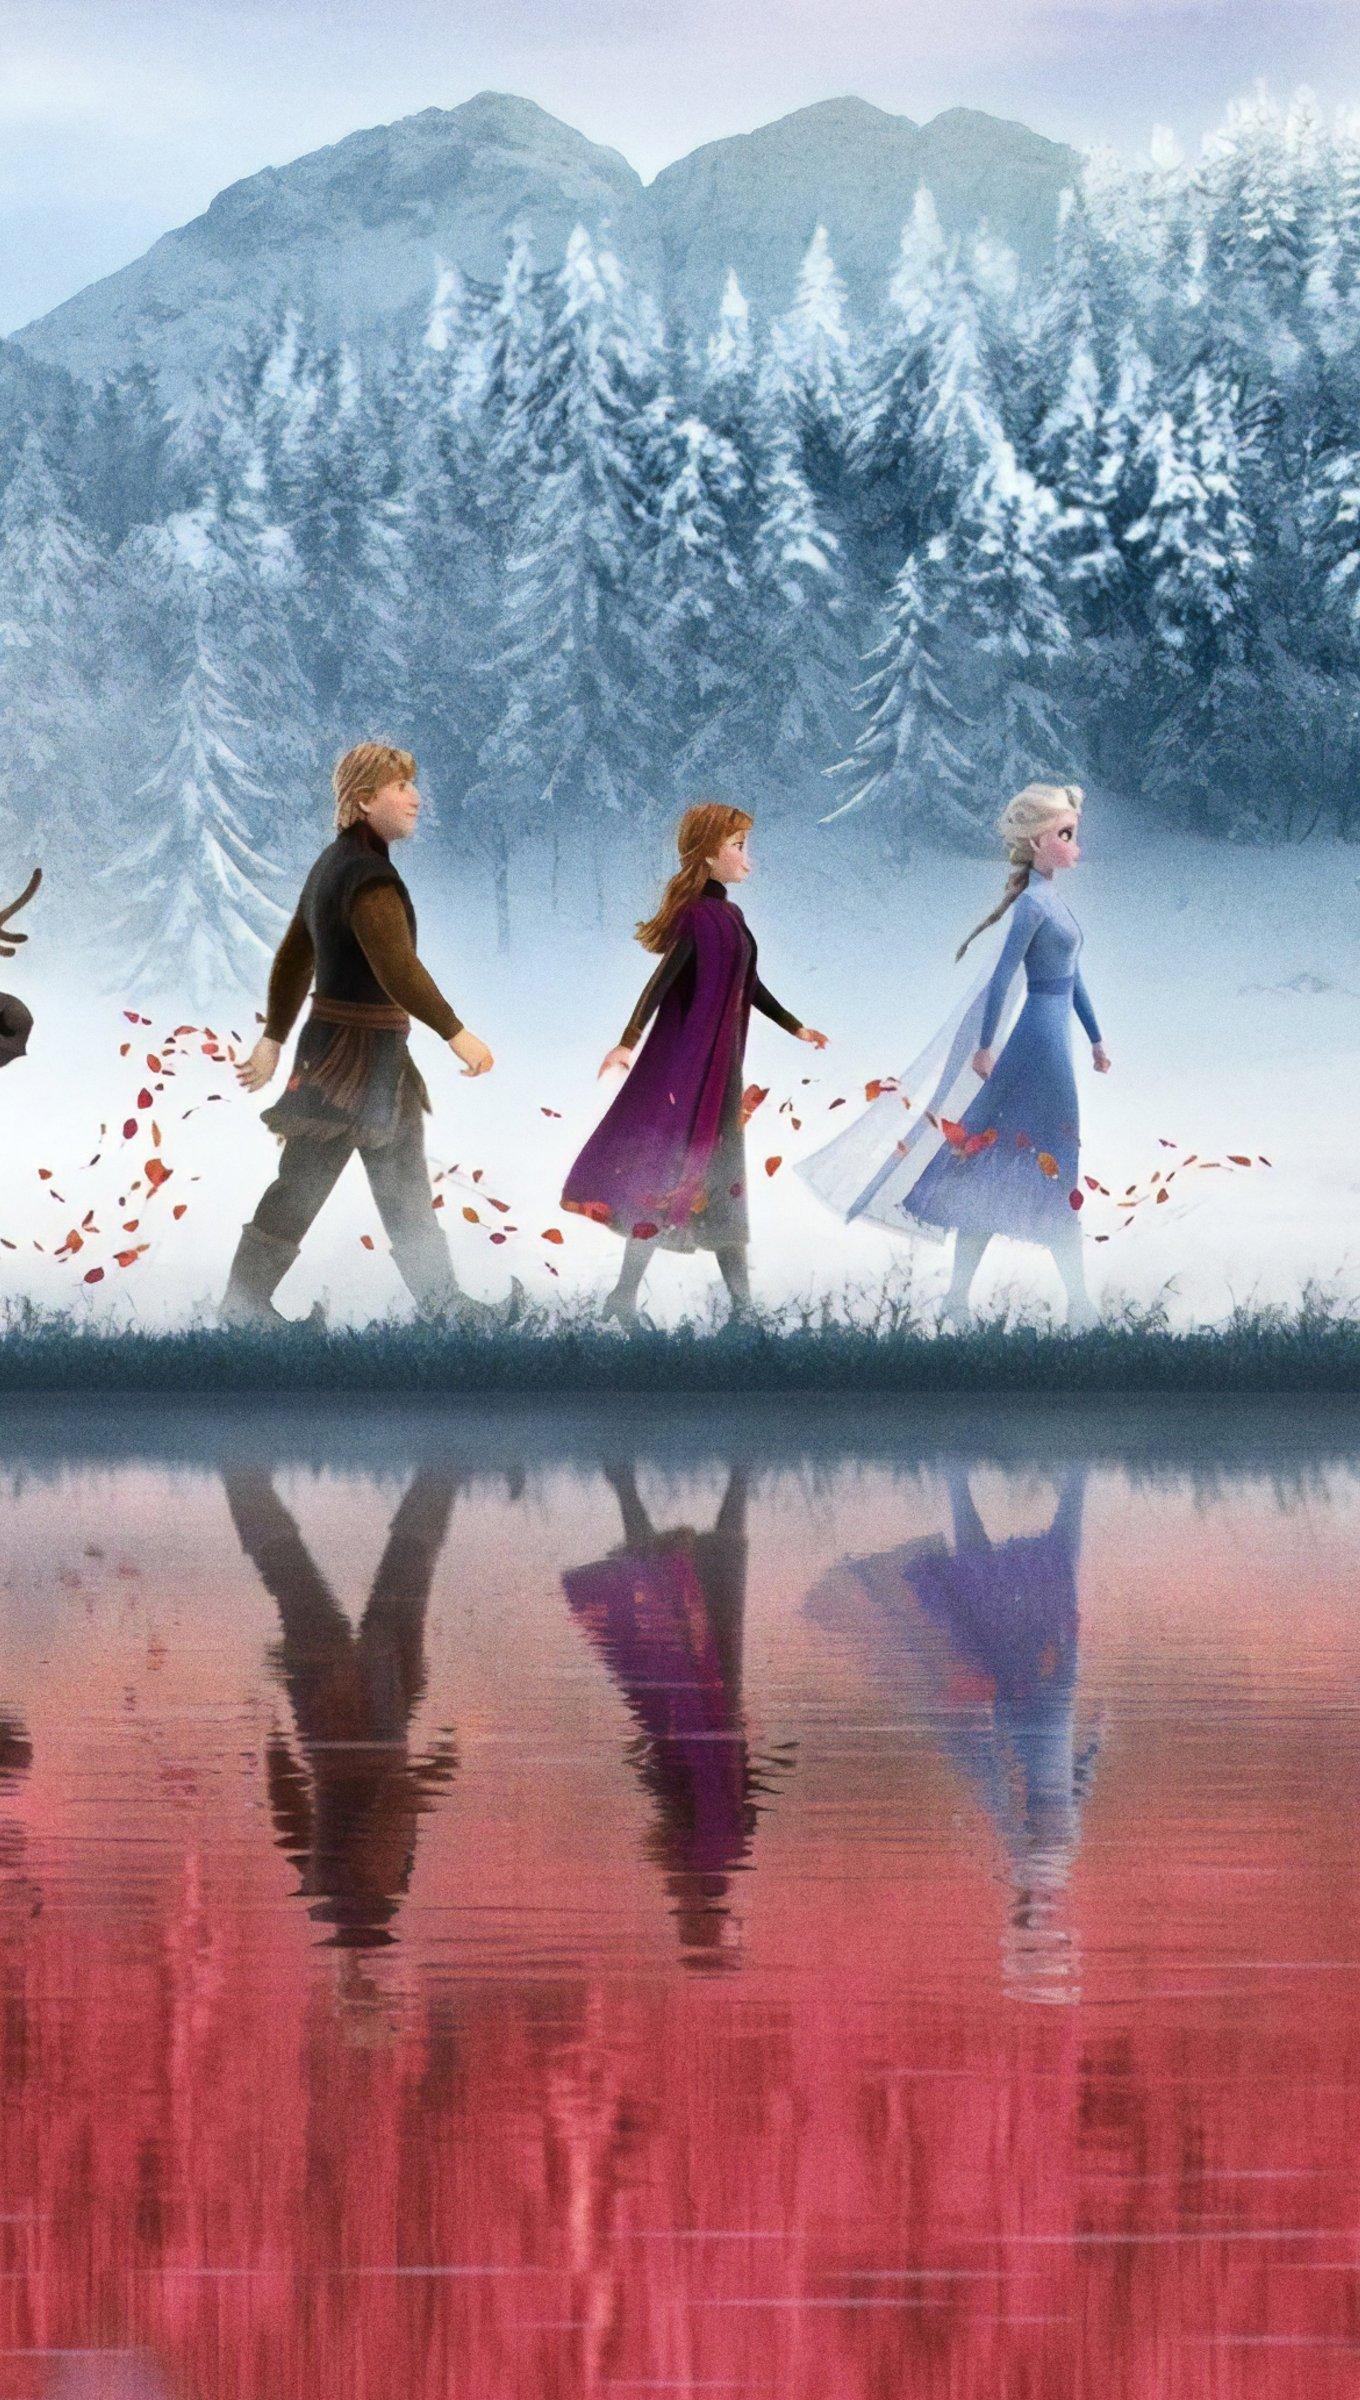 Wallpaper Characters from Frozen walking Vertical